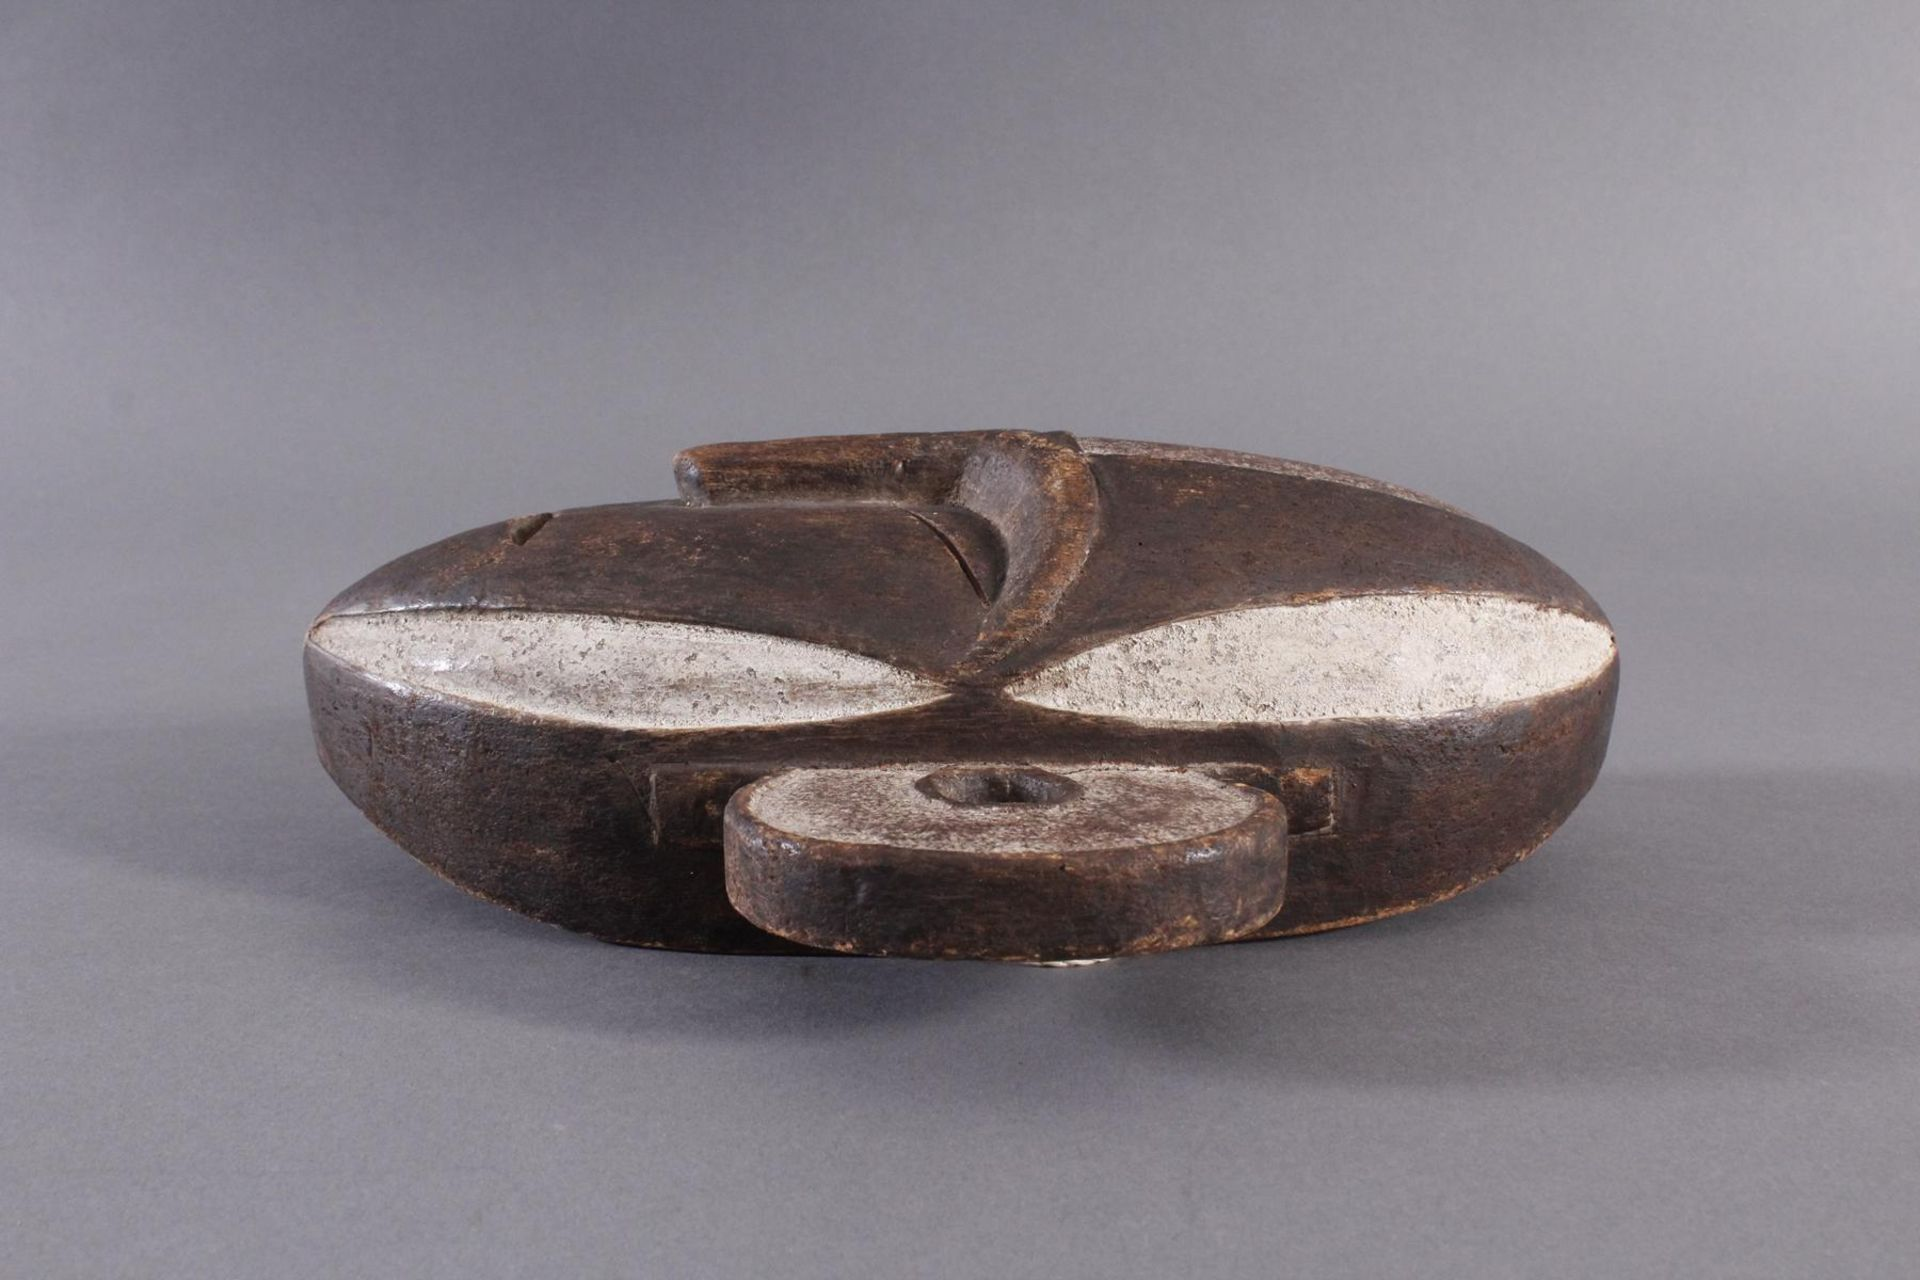 Antike Maske, Boa, Kongo 1. Hälfte 20. Jh.Holz geschnitzt, dunkle Patina, Reste weißer Bemalung, - Bild 5 aus 6